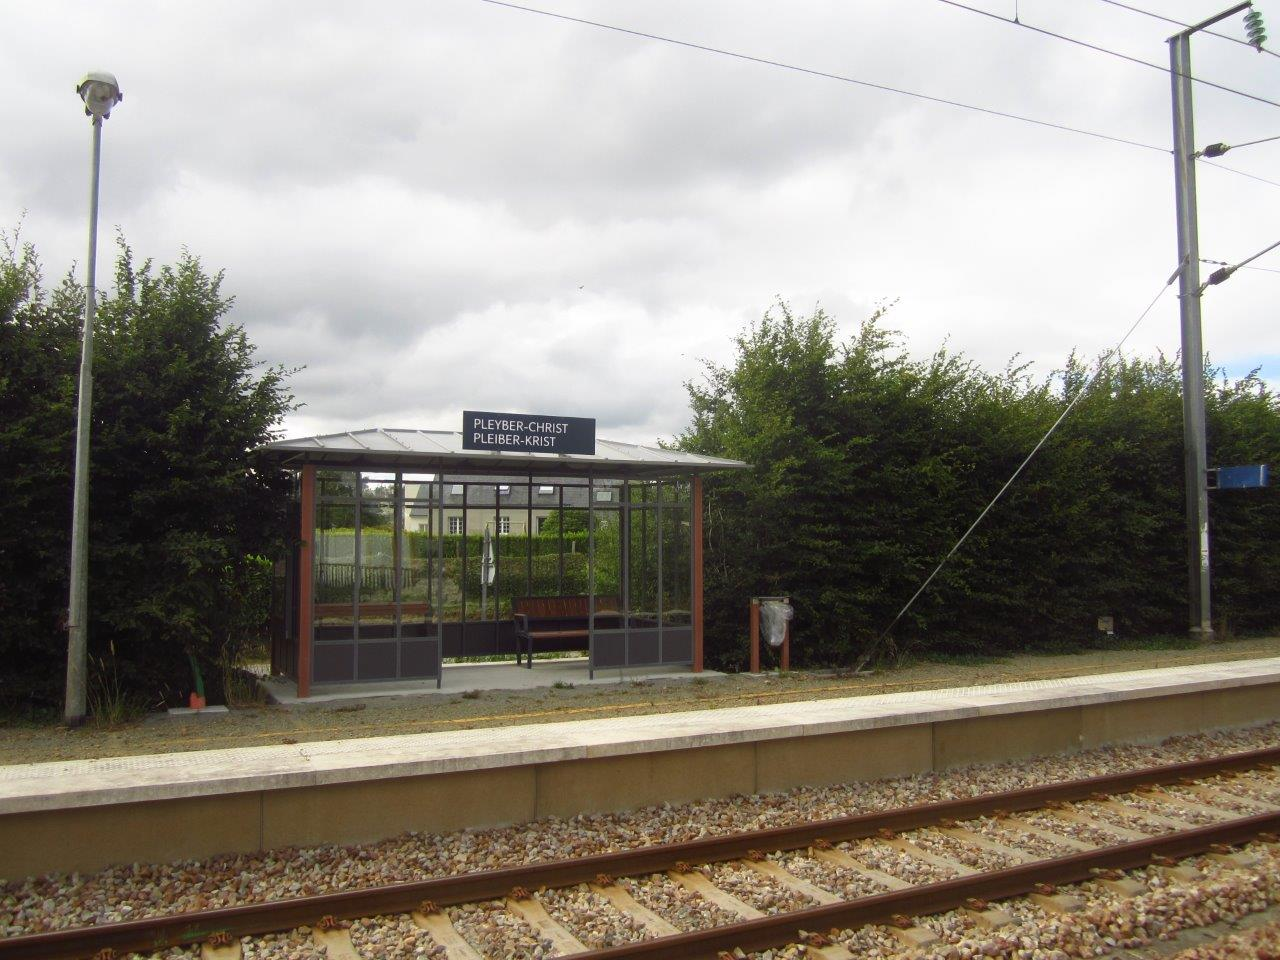 gare-de-pleyber-christ-train-station